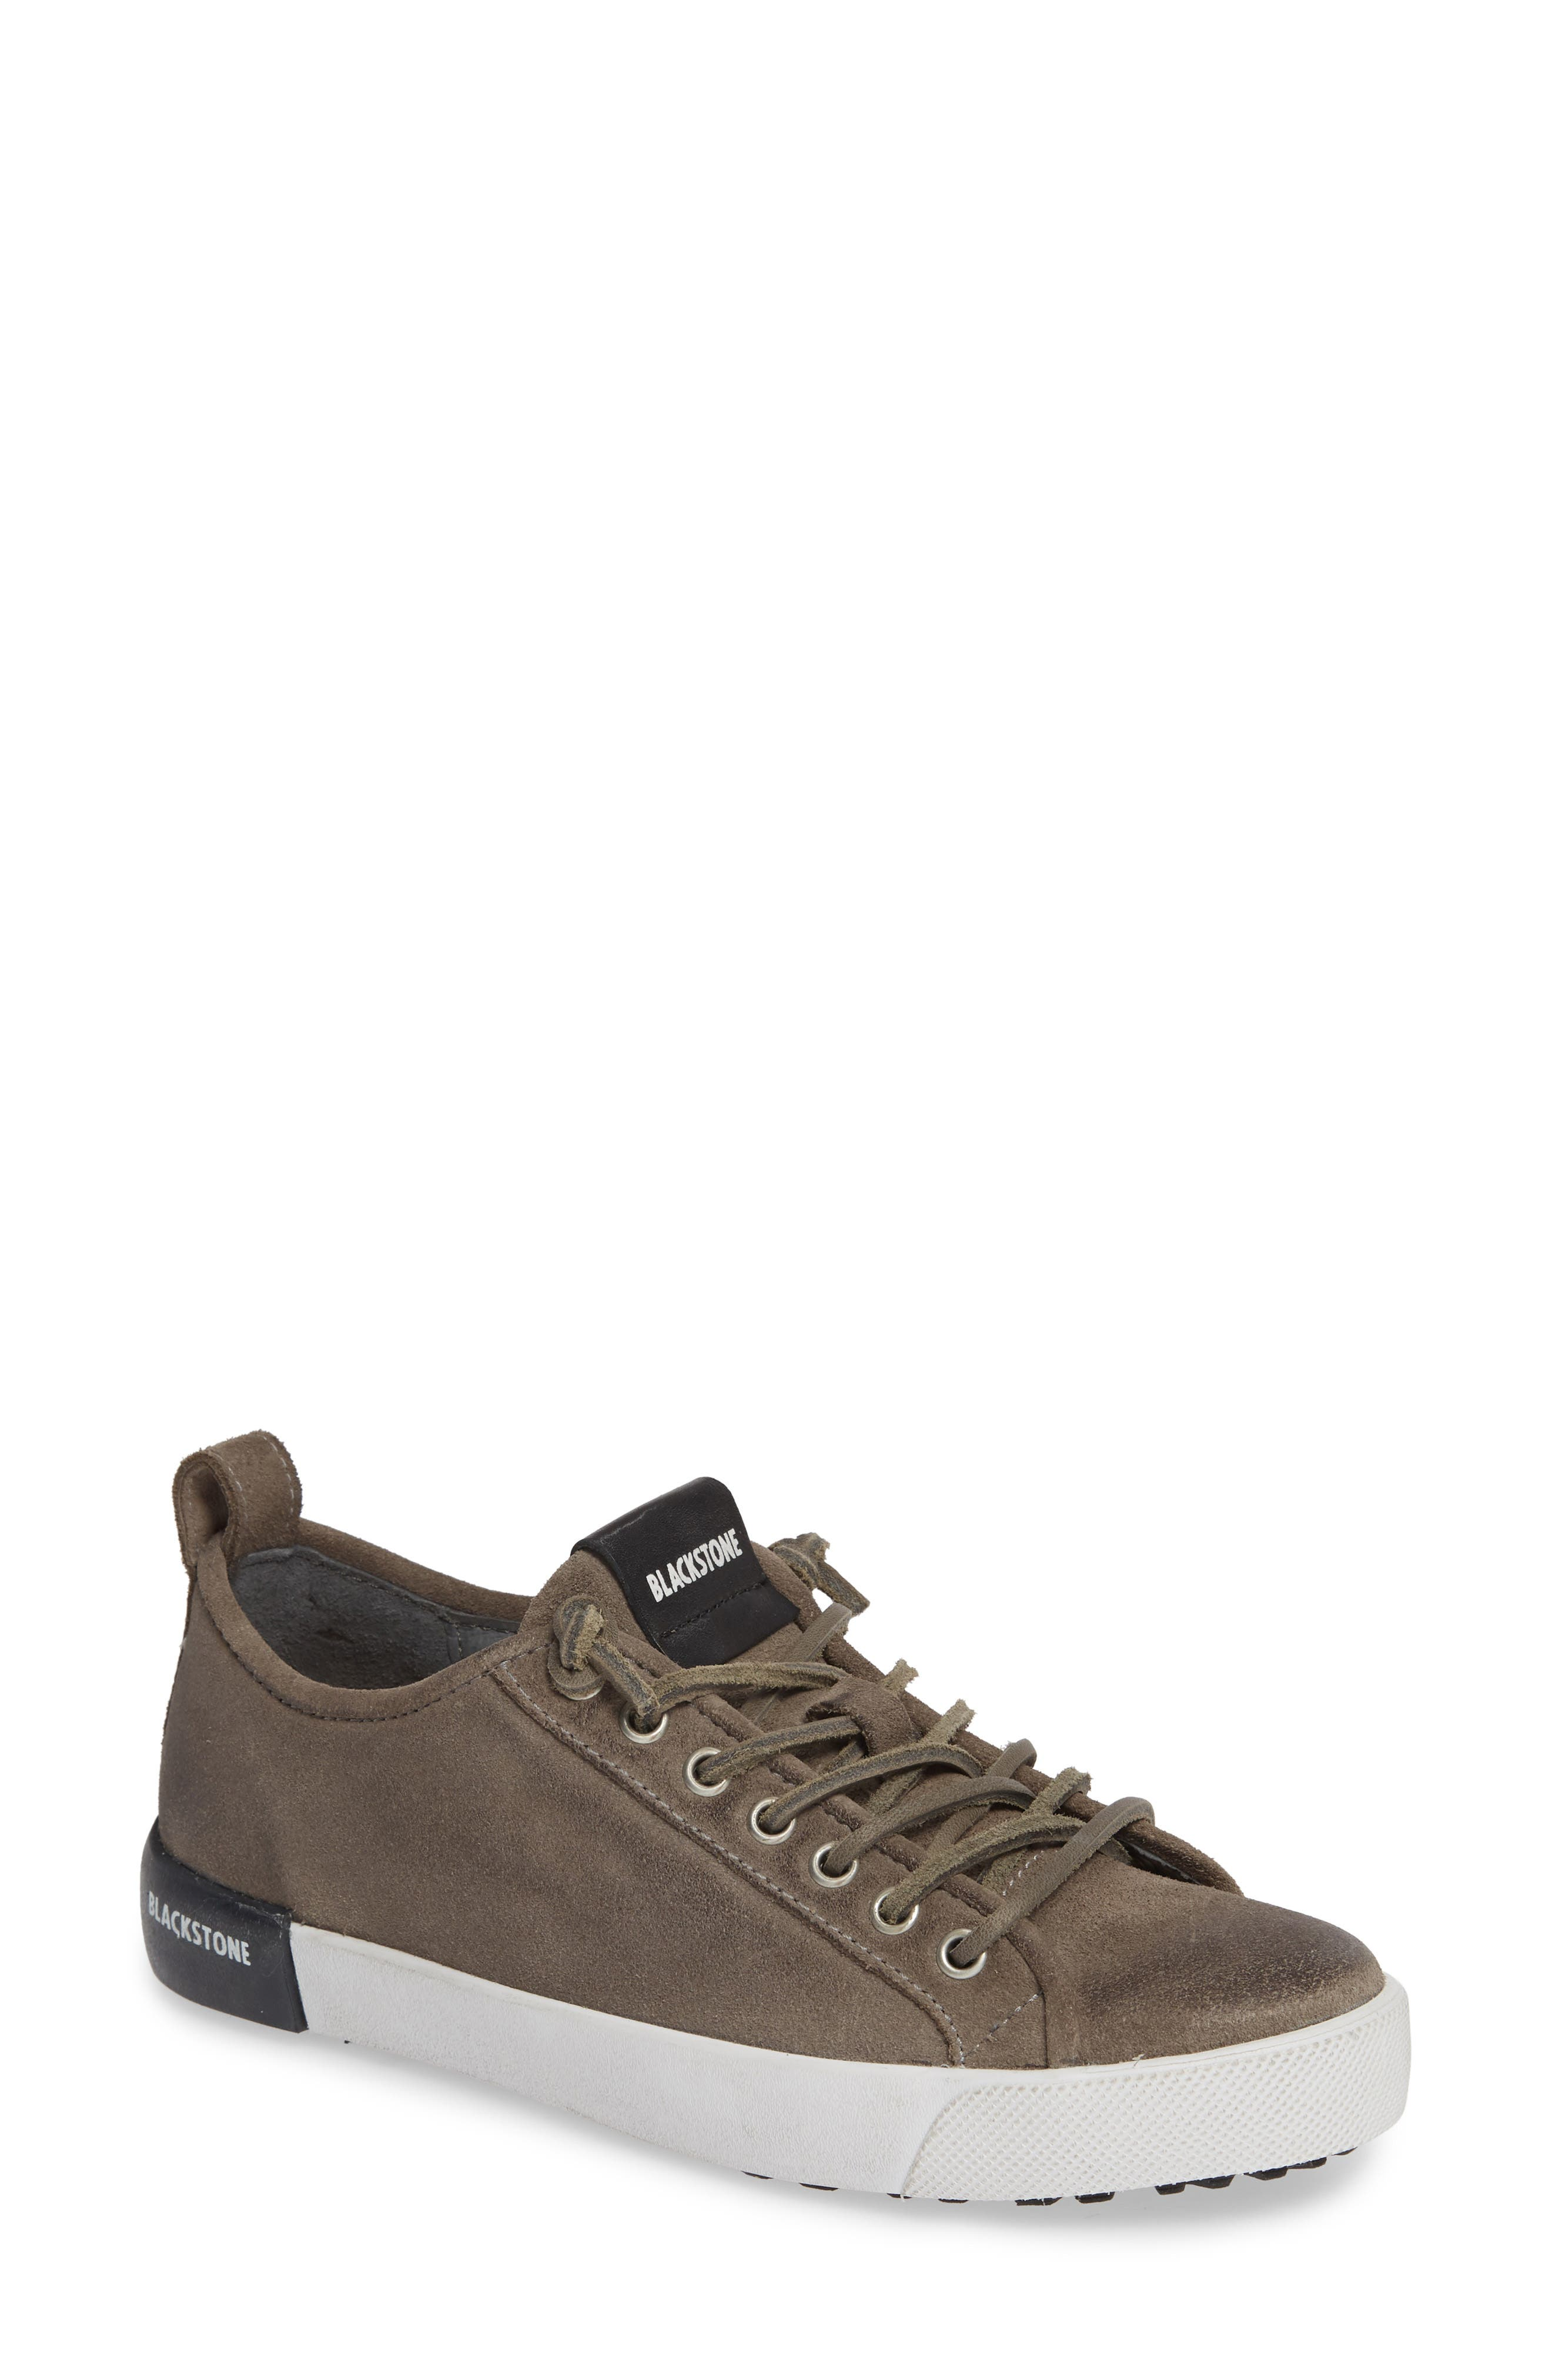 Blackstone Gl60 Sneaker, Grey